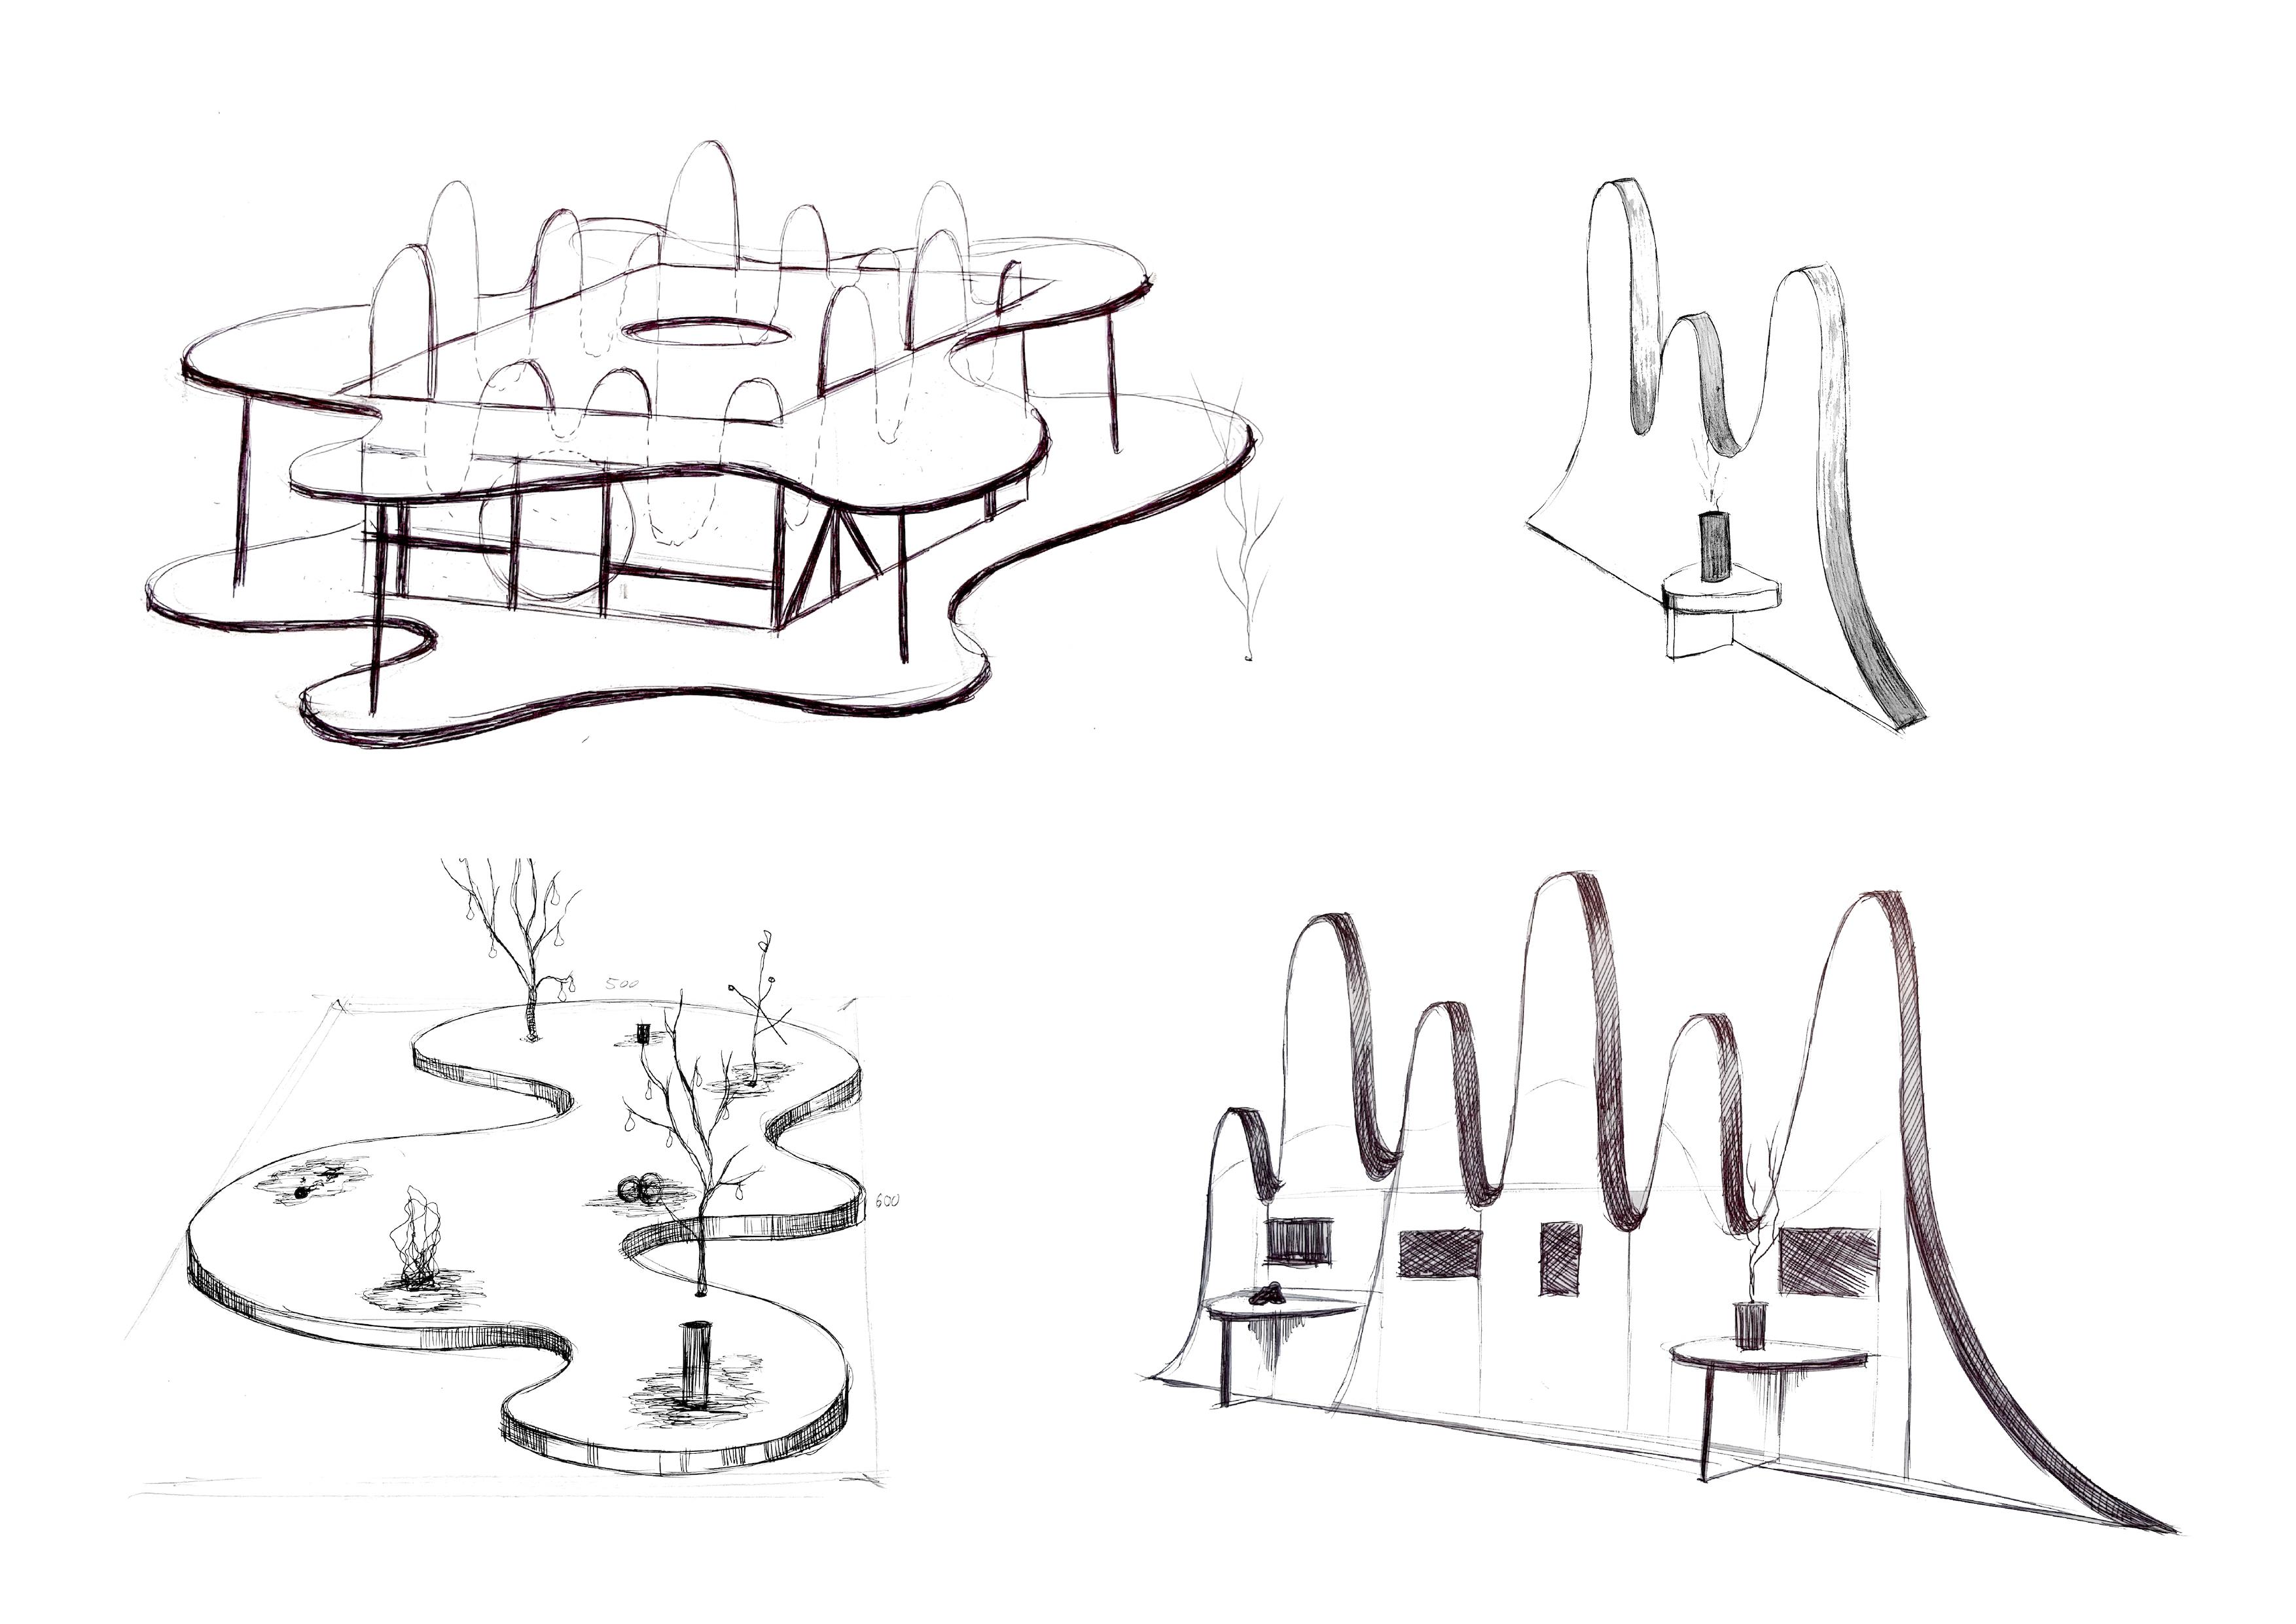 Billedet viser skitser til pavillion og scenografi til udstillingen 'Winterfest'